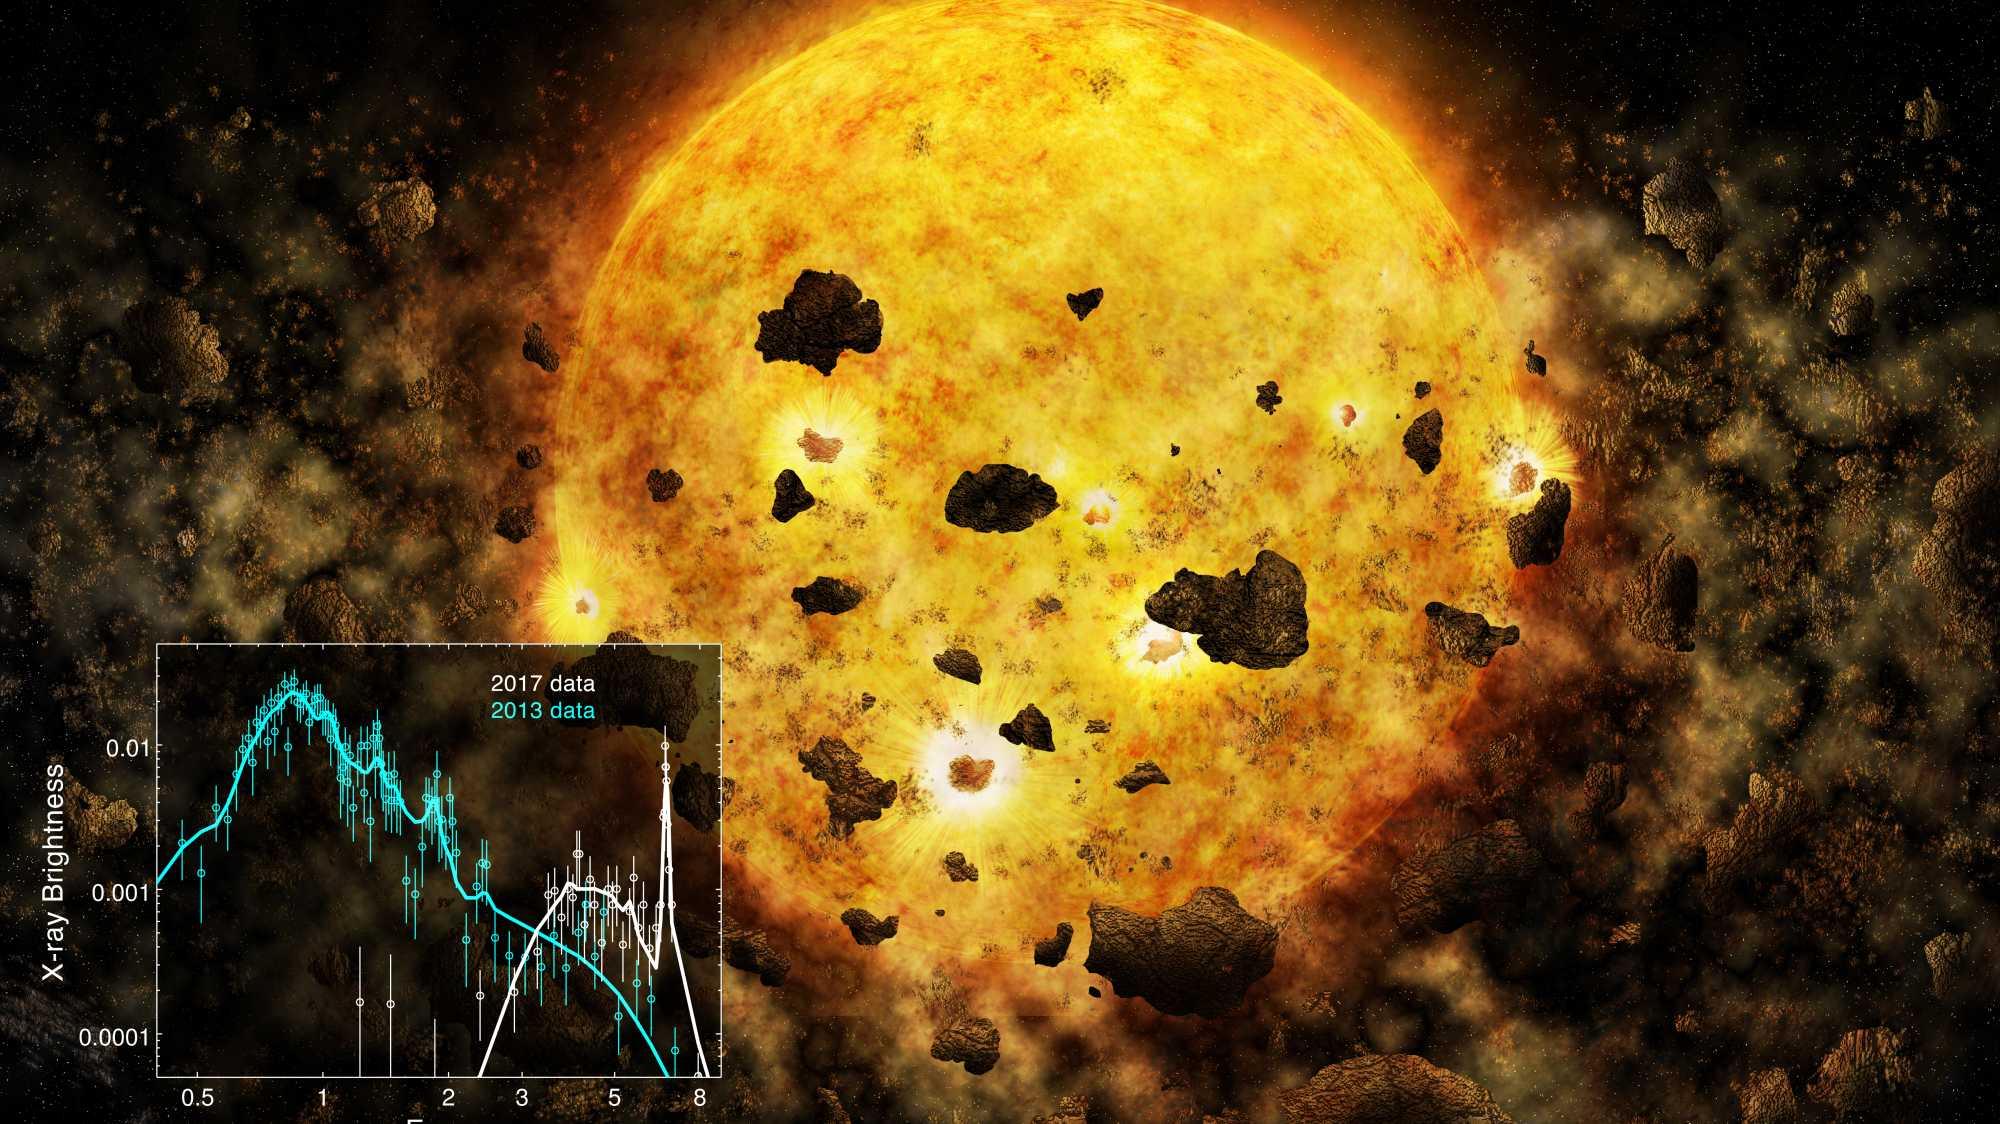 Planeten-Killer: Chandra beobachtet Stern, der wohl einen Planeten verschlingt